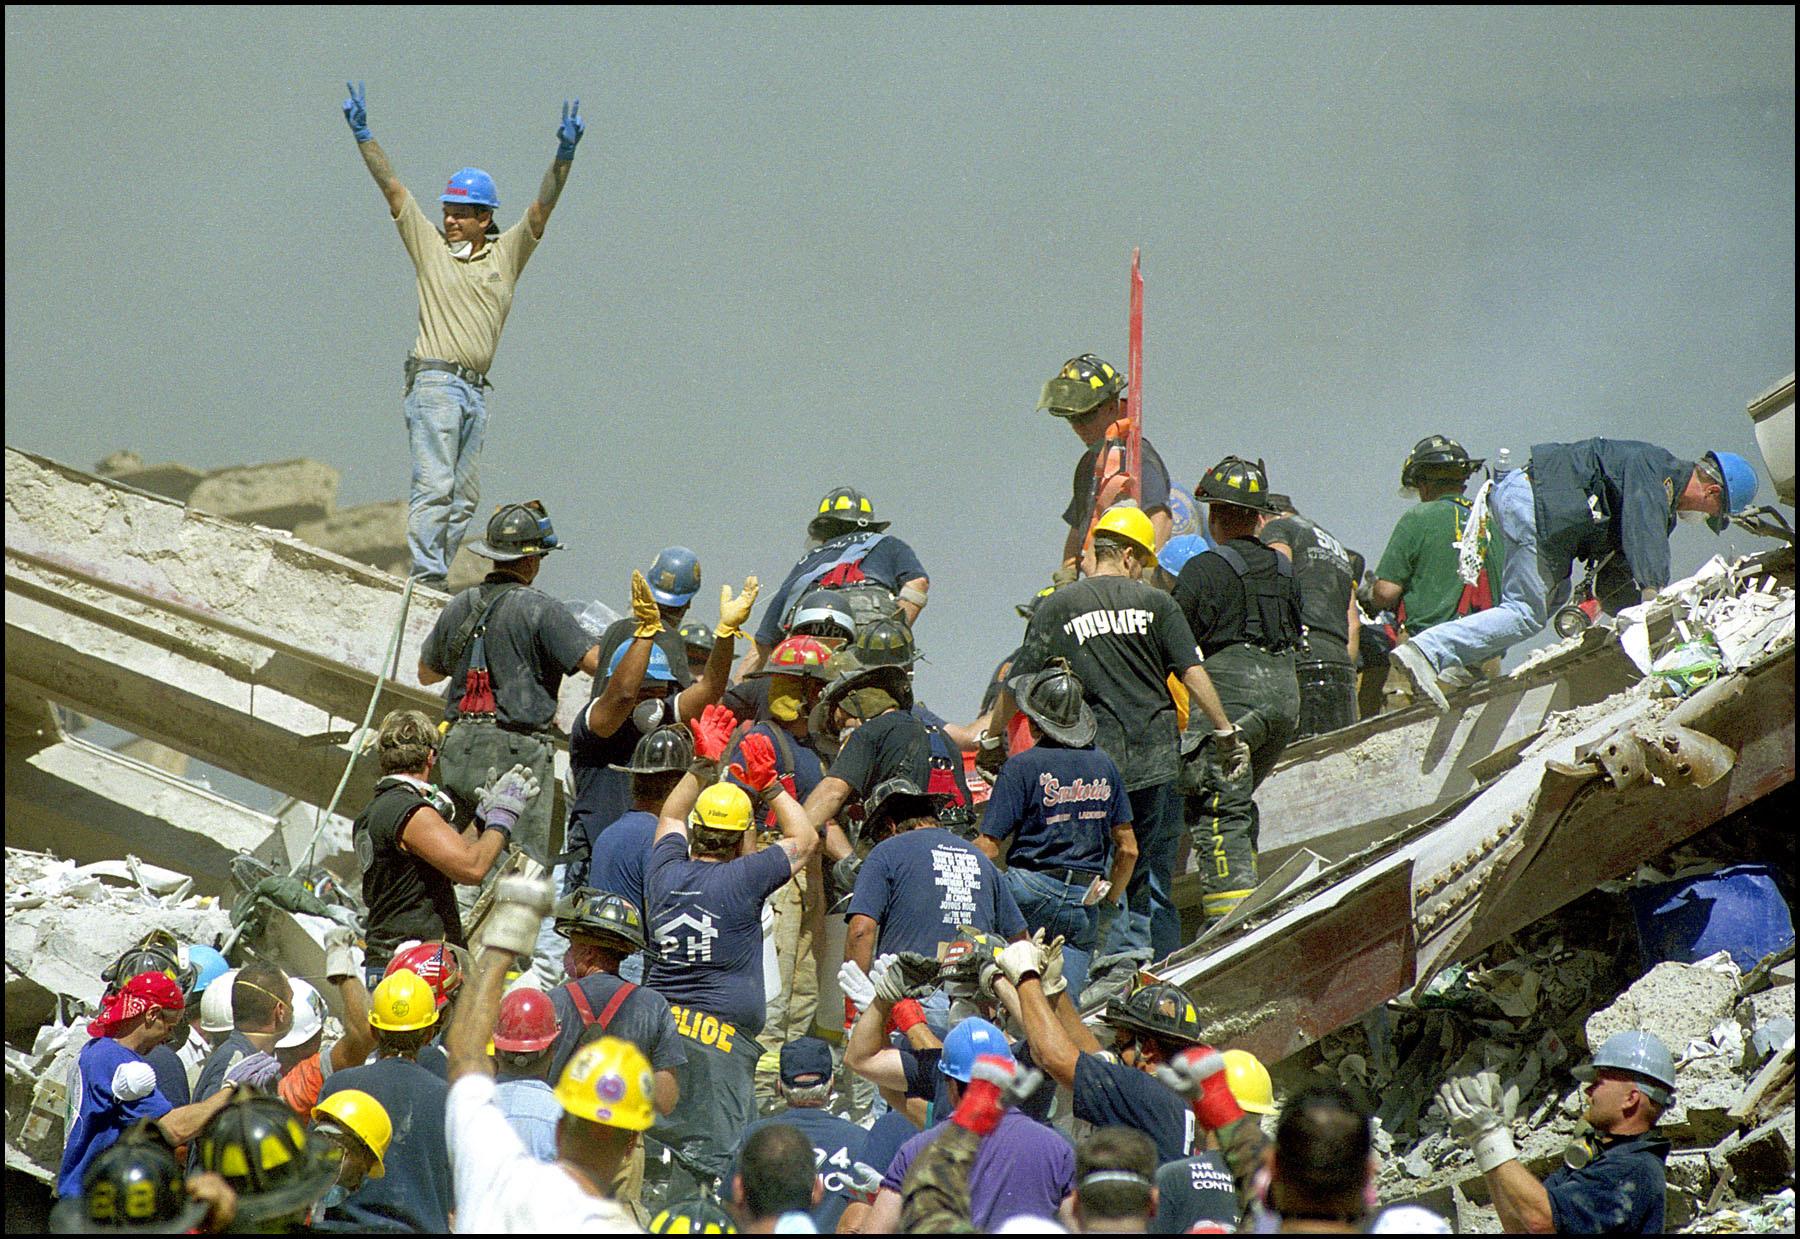 9-11-2001_009